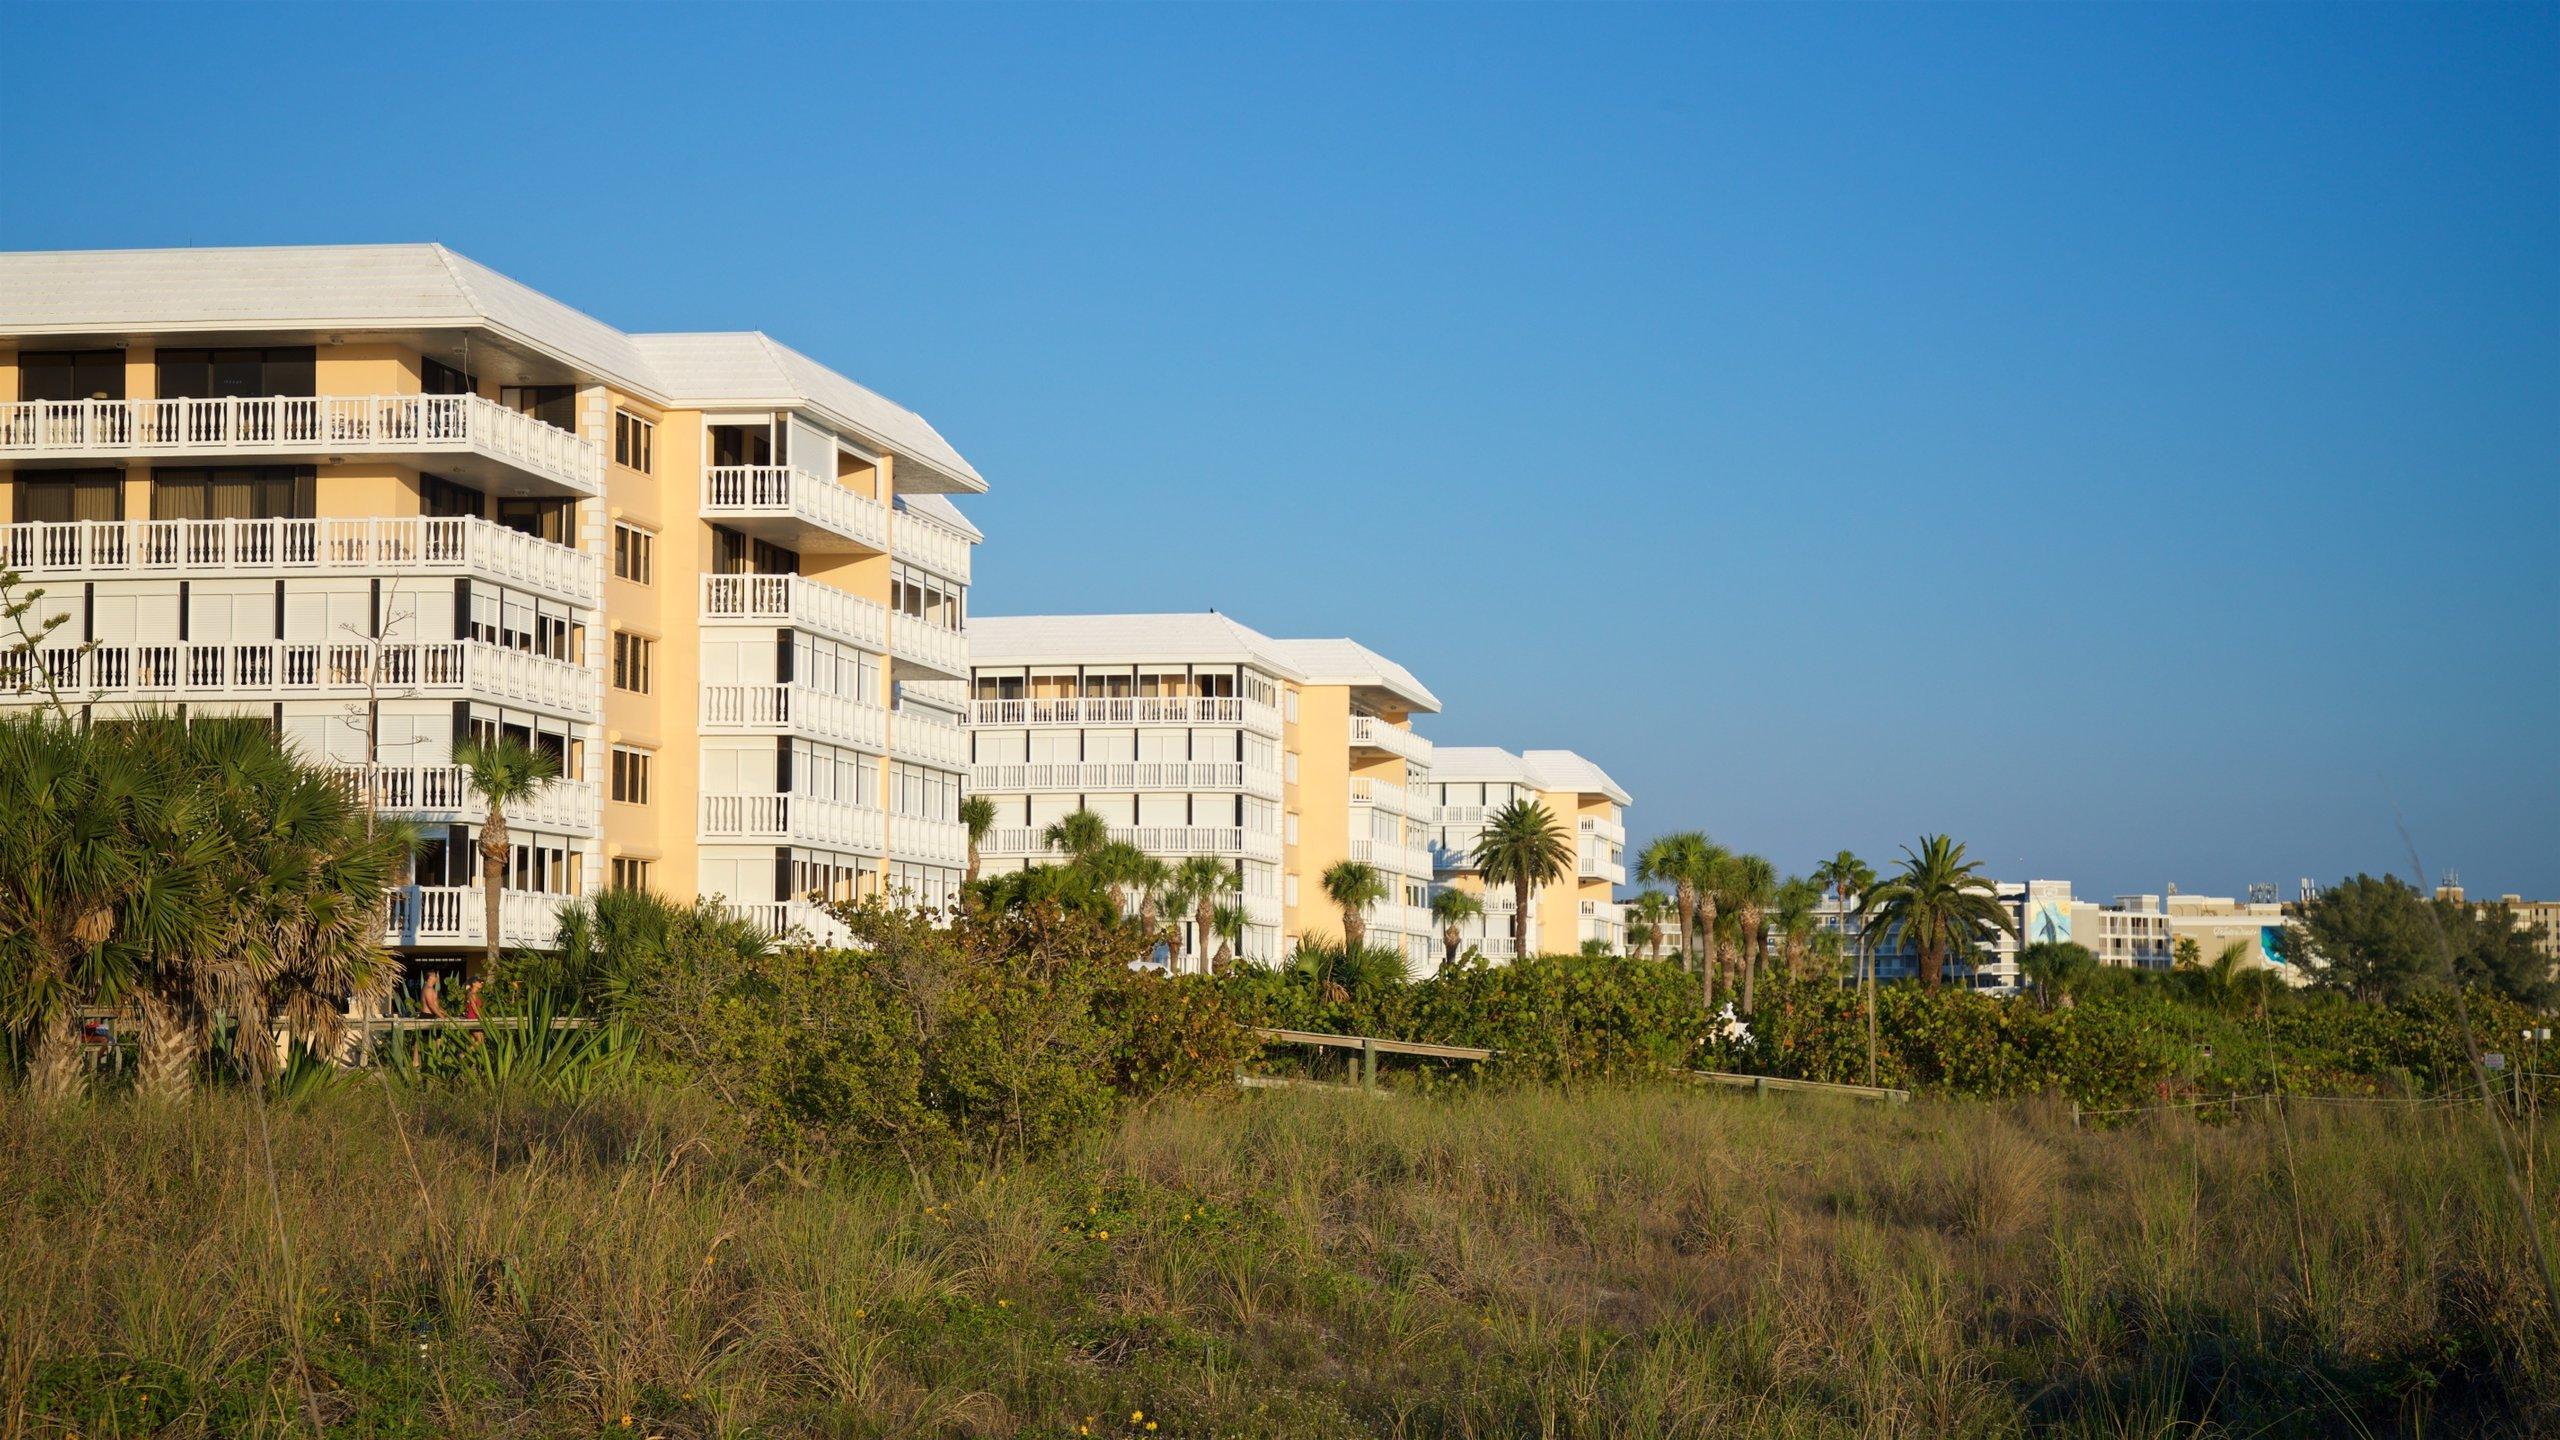 St. Pete Beach, Florida, USA